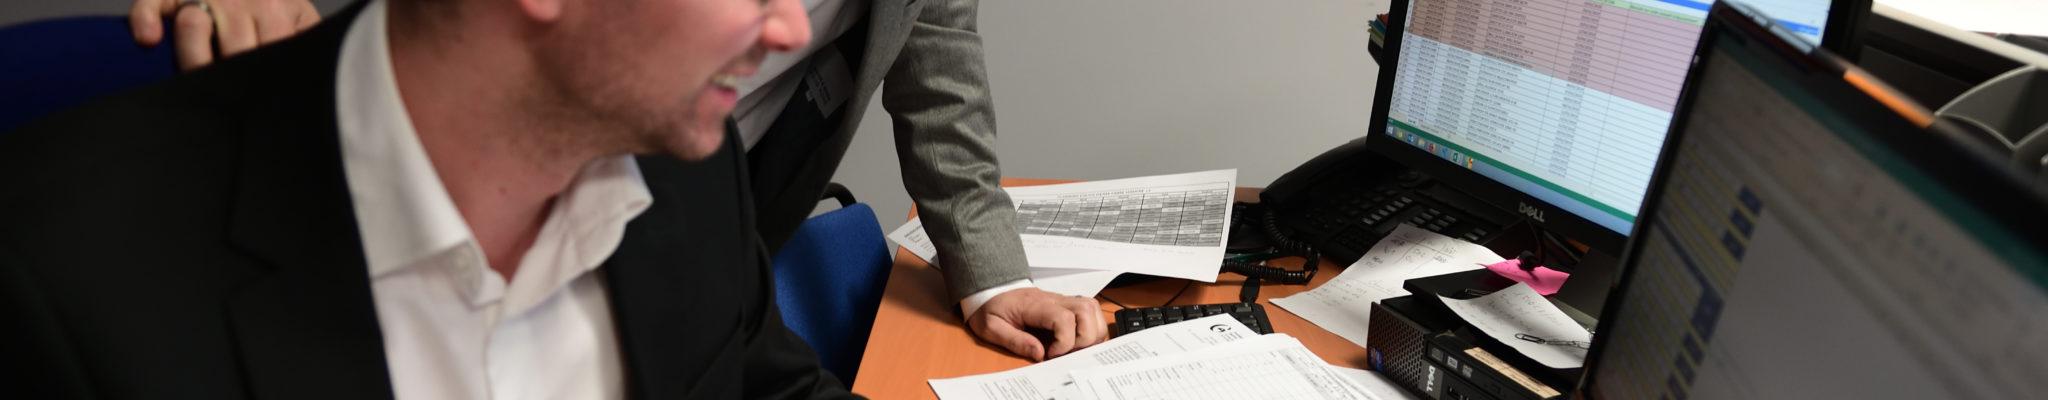 Recrutement-Chef-de-projet-Marketing-DPI-Expérience